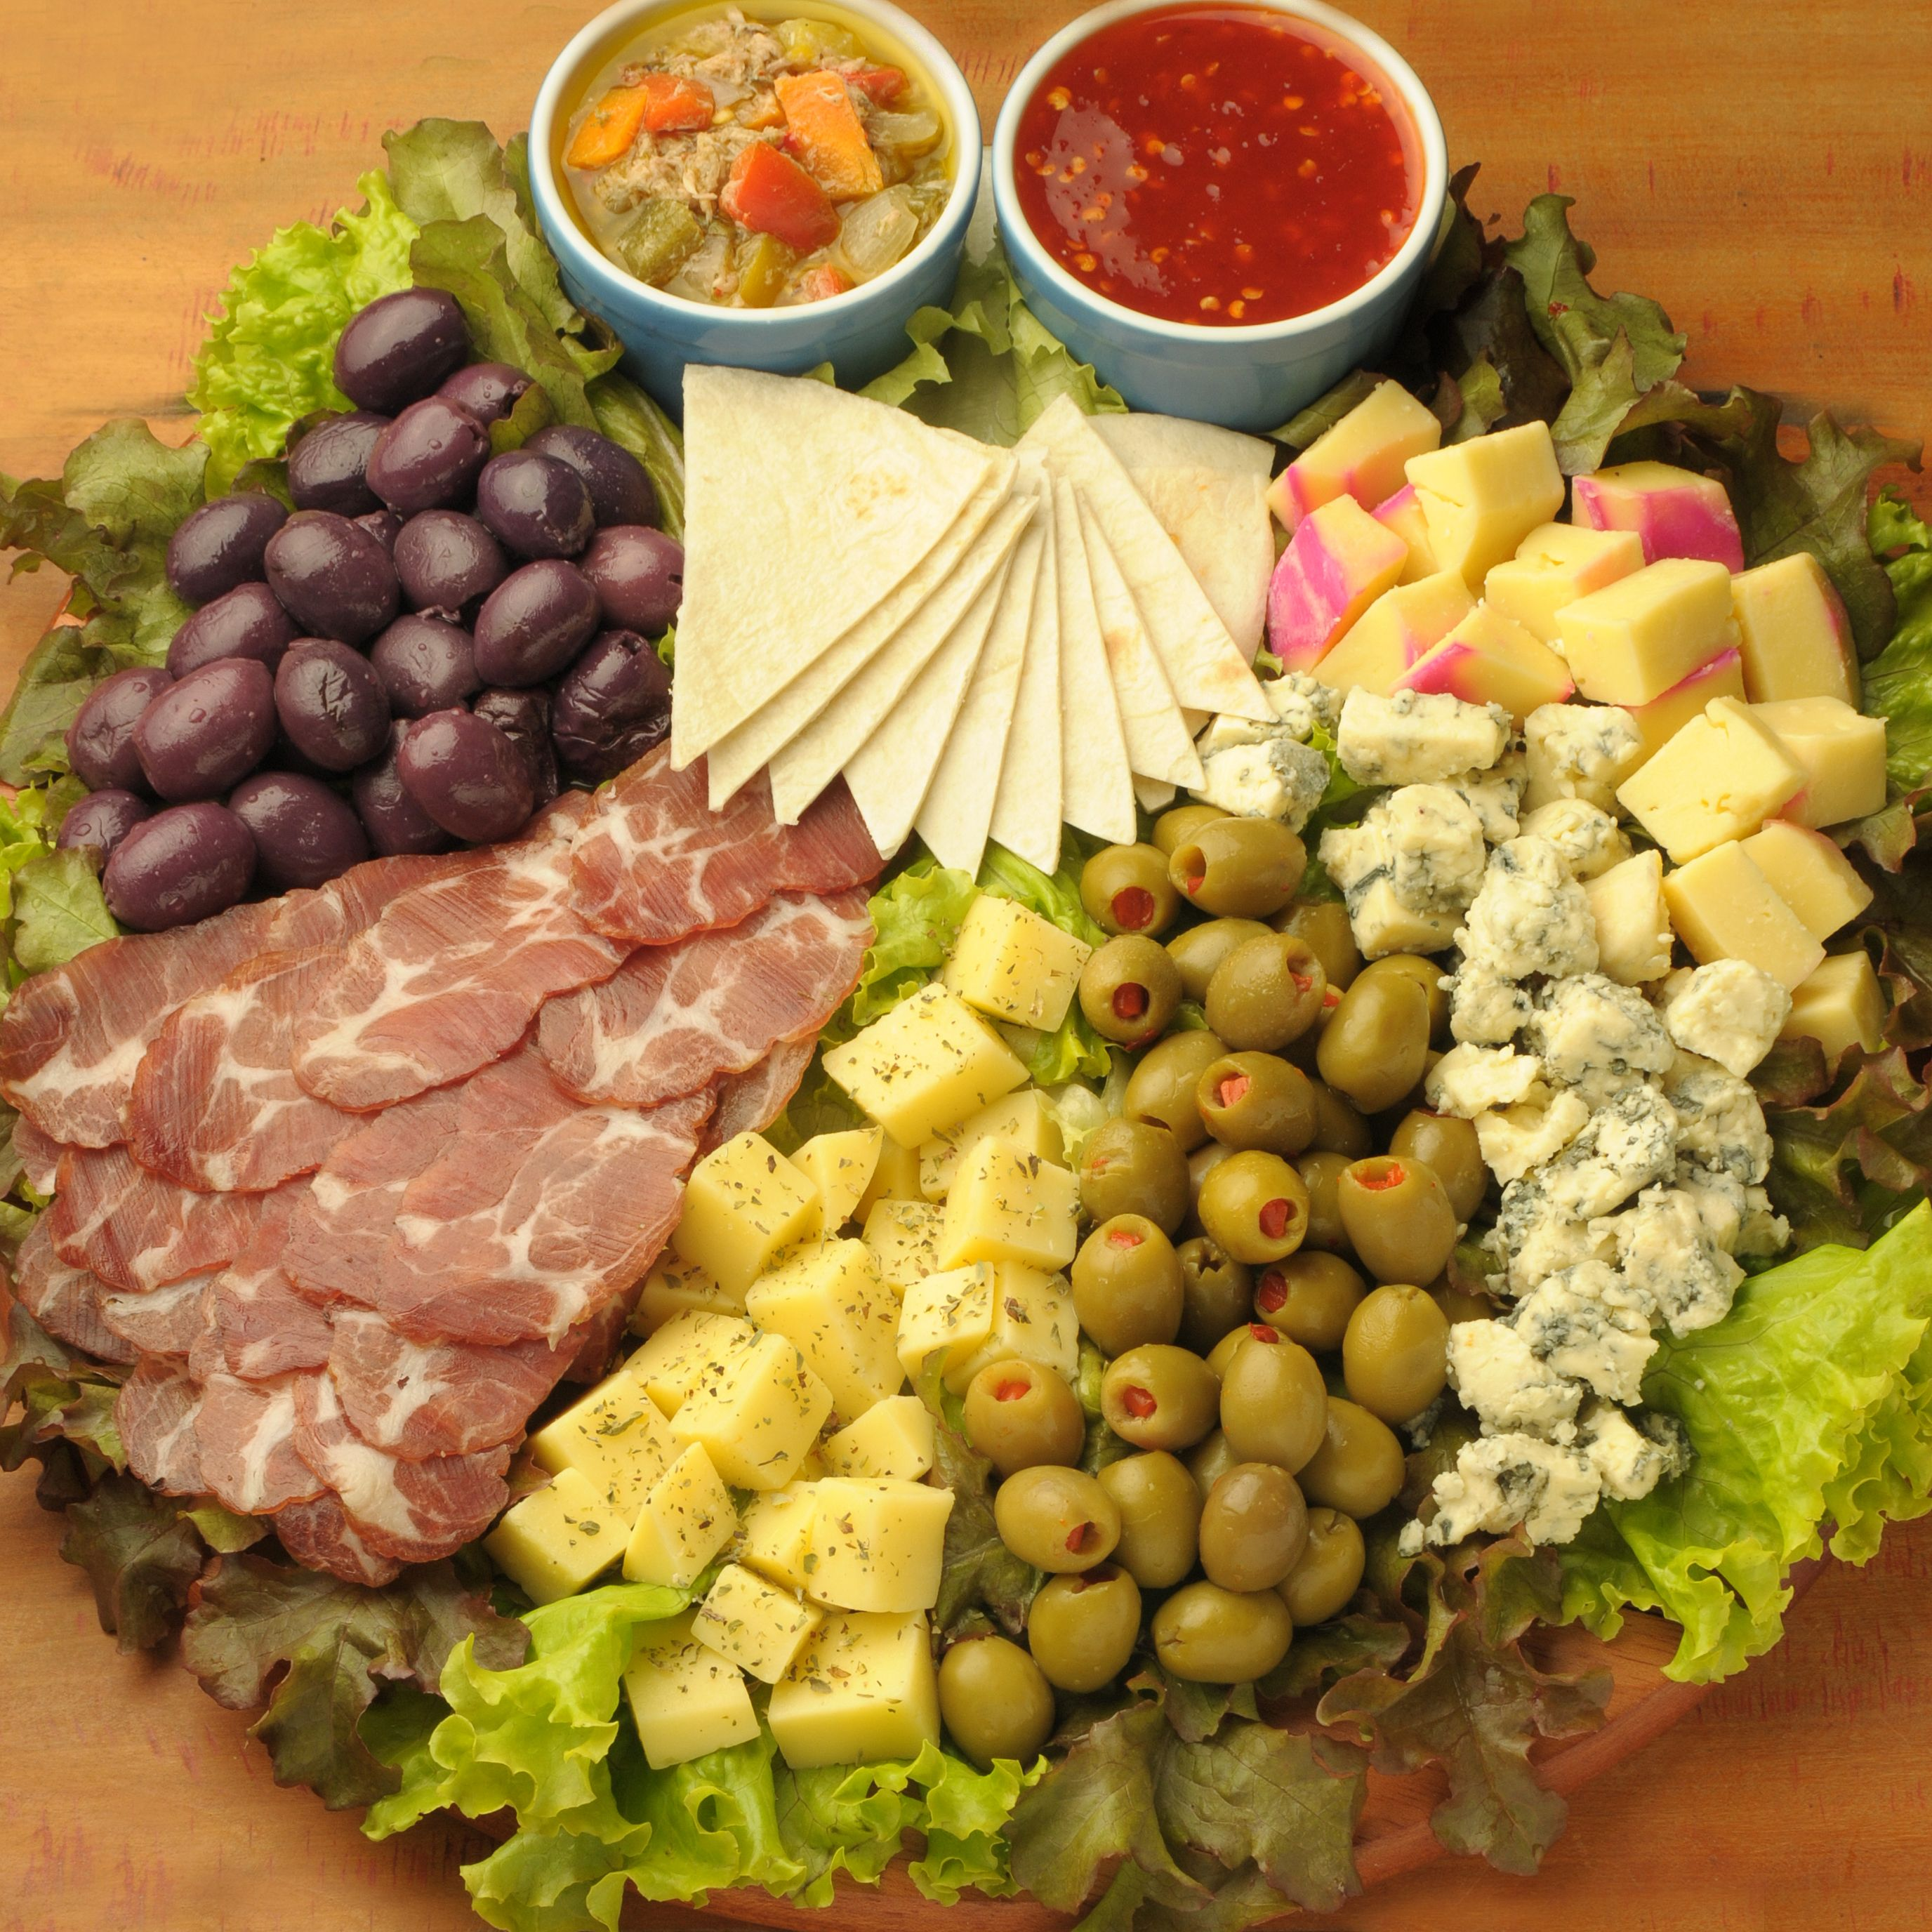 T bua de frios festa de boteco pinterest t bua de frios tipos de queijo e salame - Alimentos frios ...